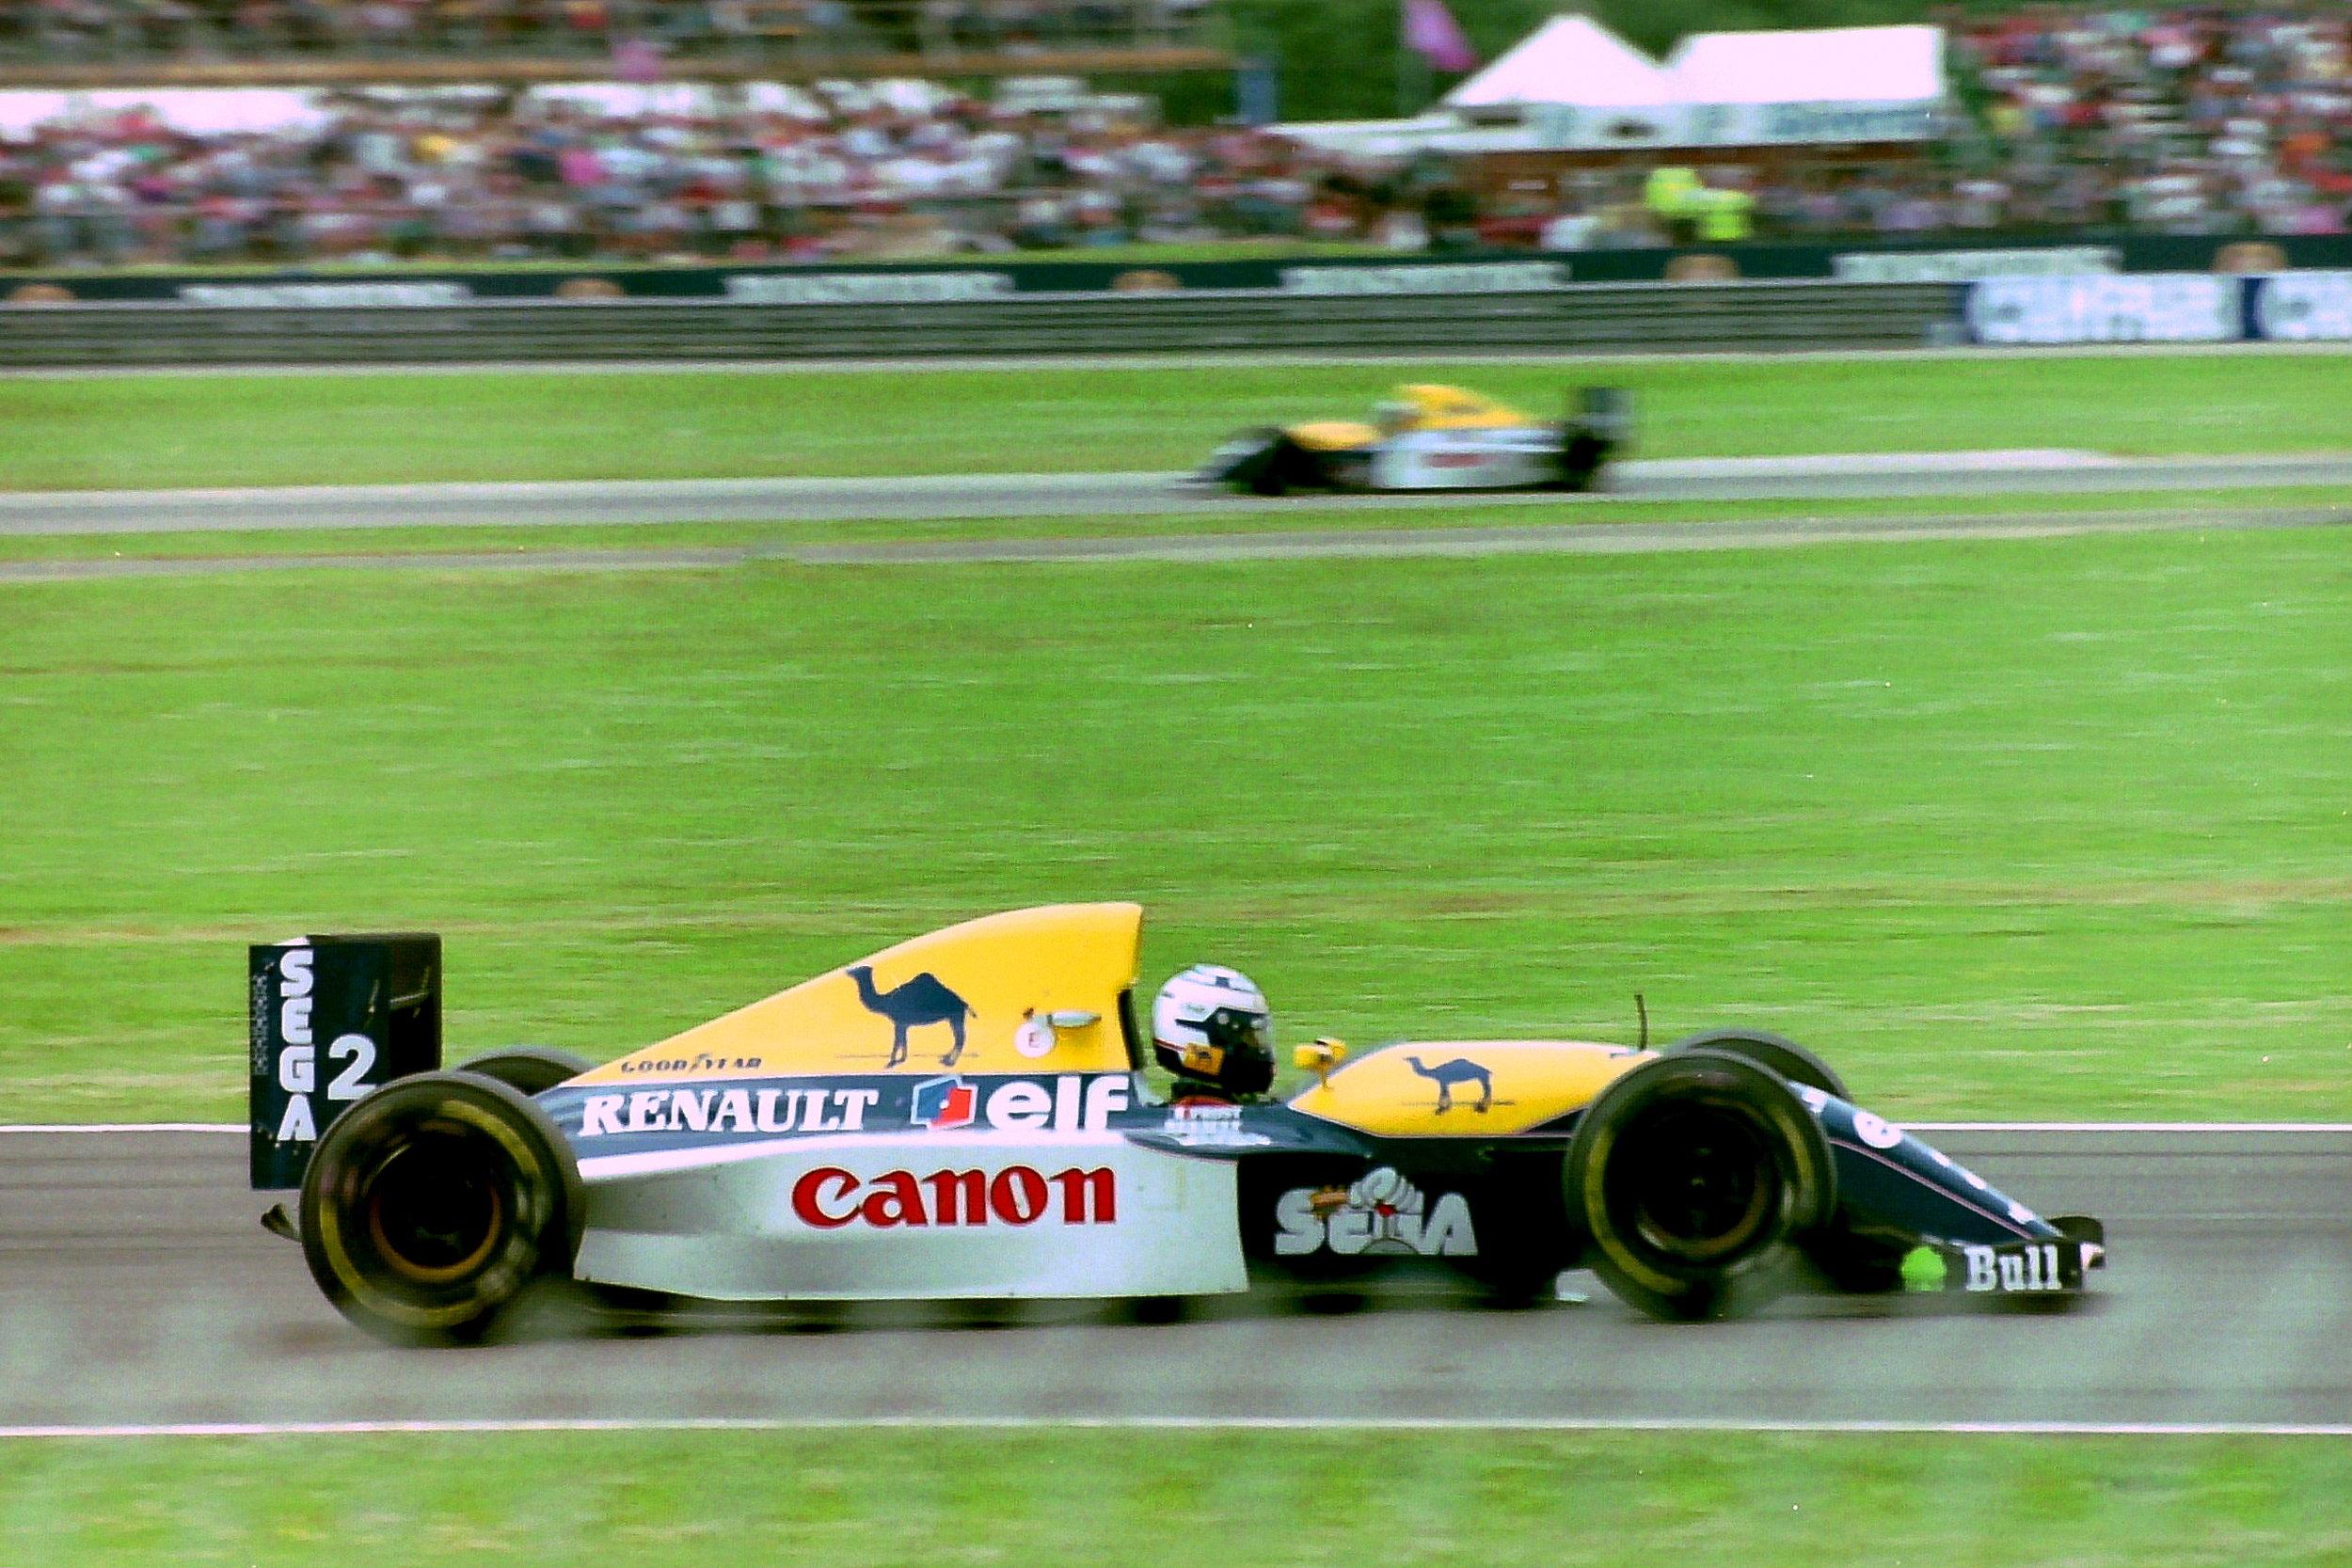 1993 - Canon Williams Renault